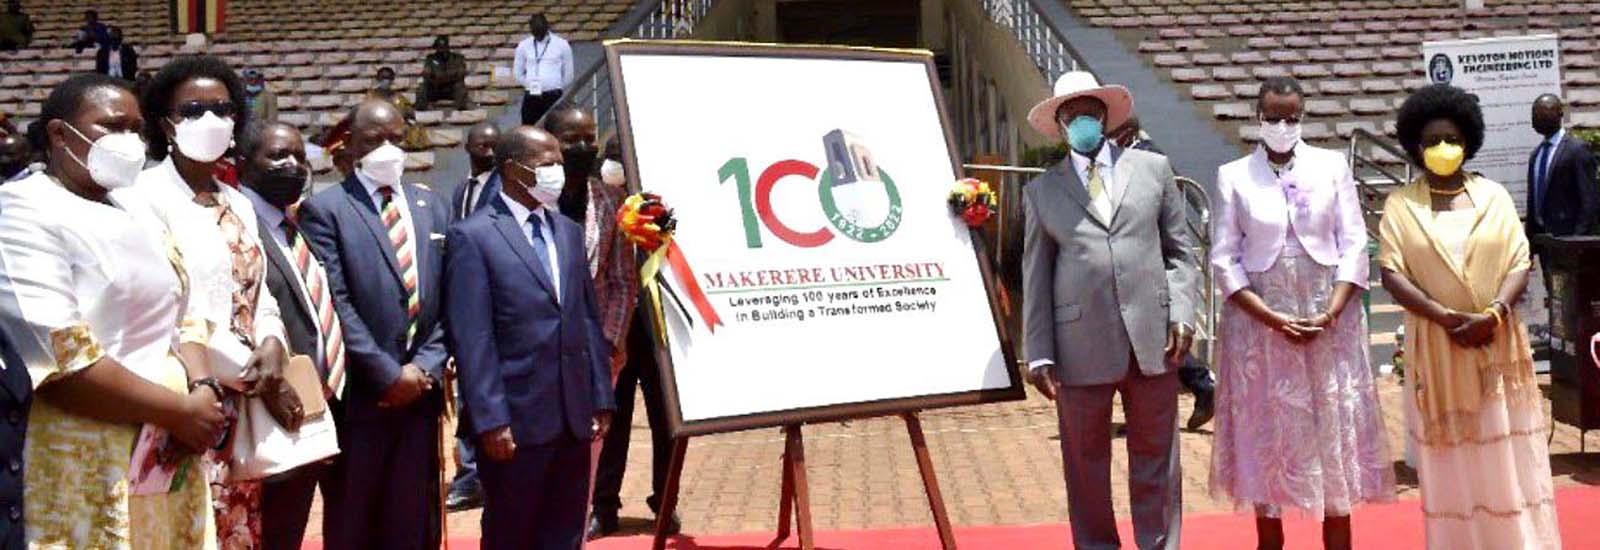 President Launches Mak@100 Celebrations